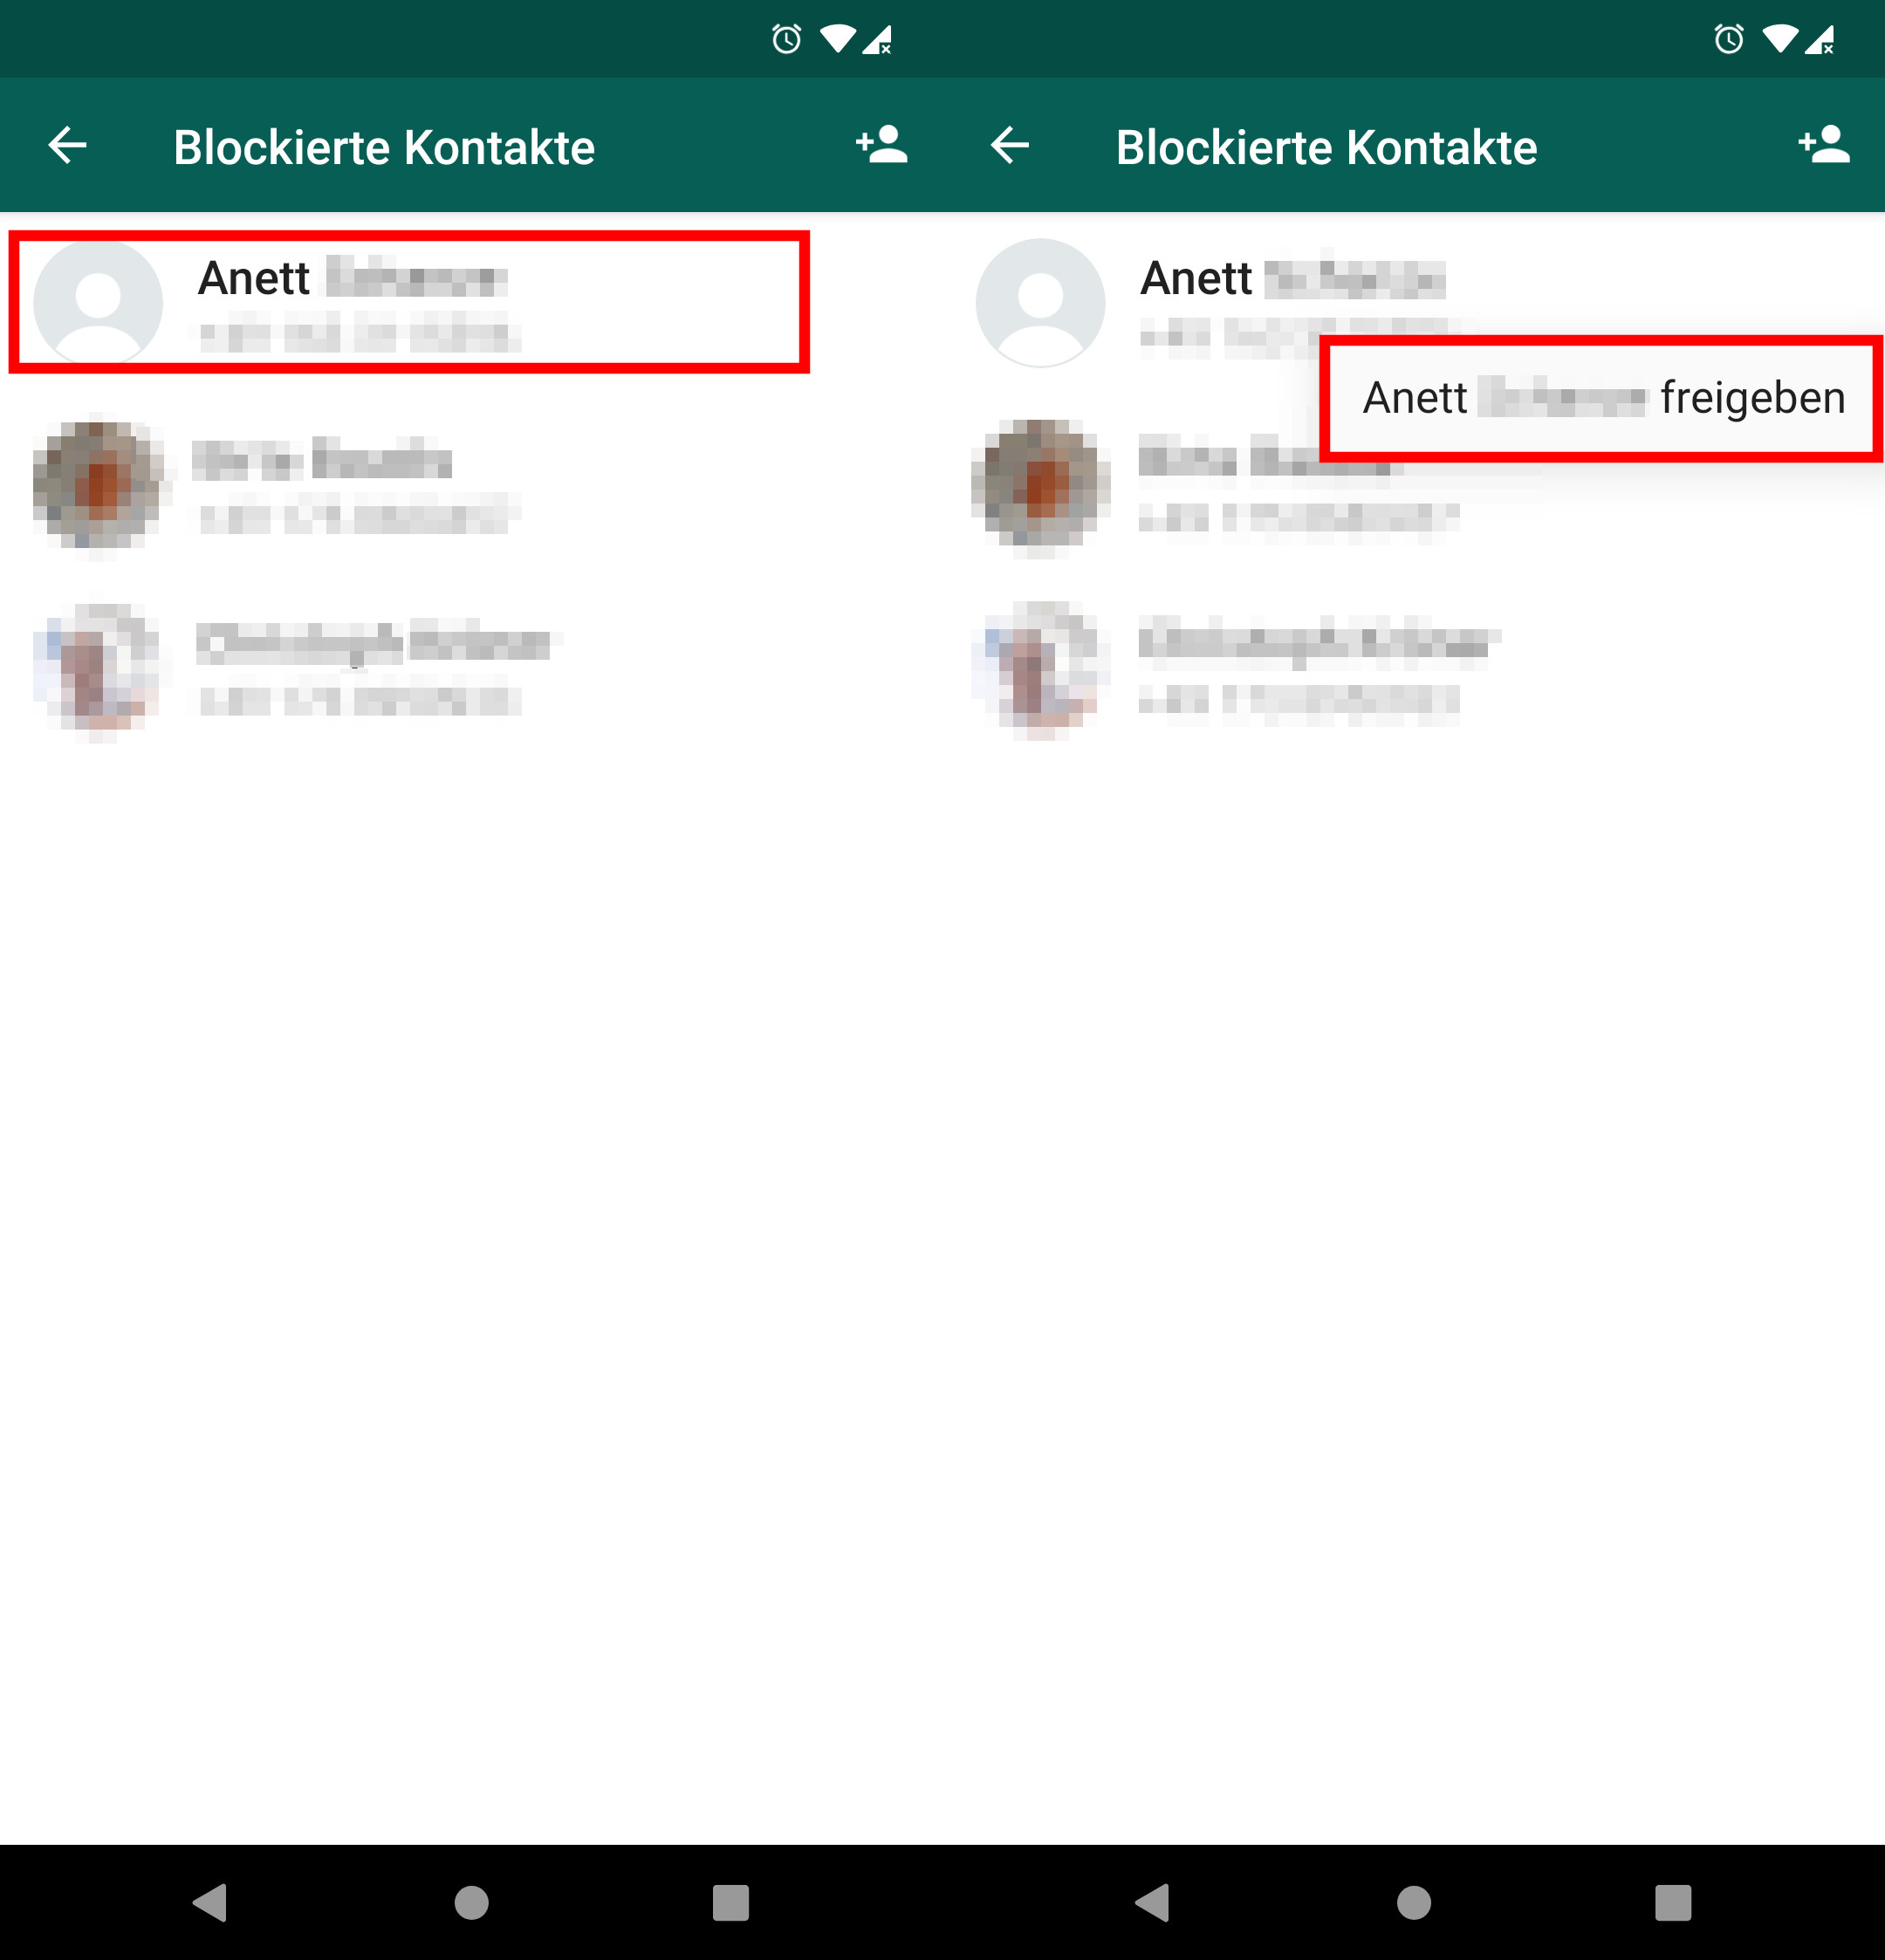 Whatsapp blockierte kontakte sehen profilbild